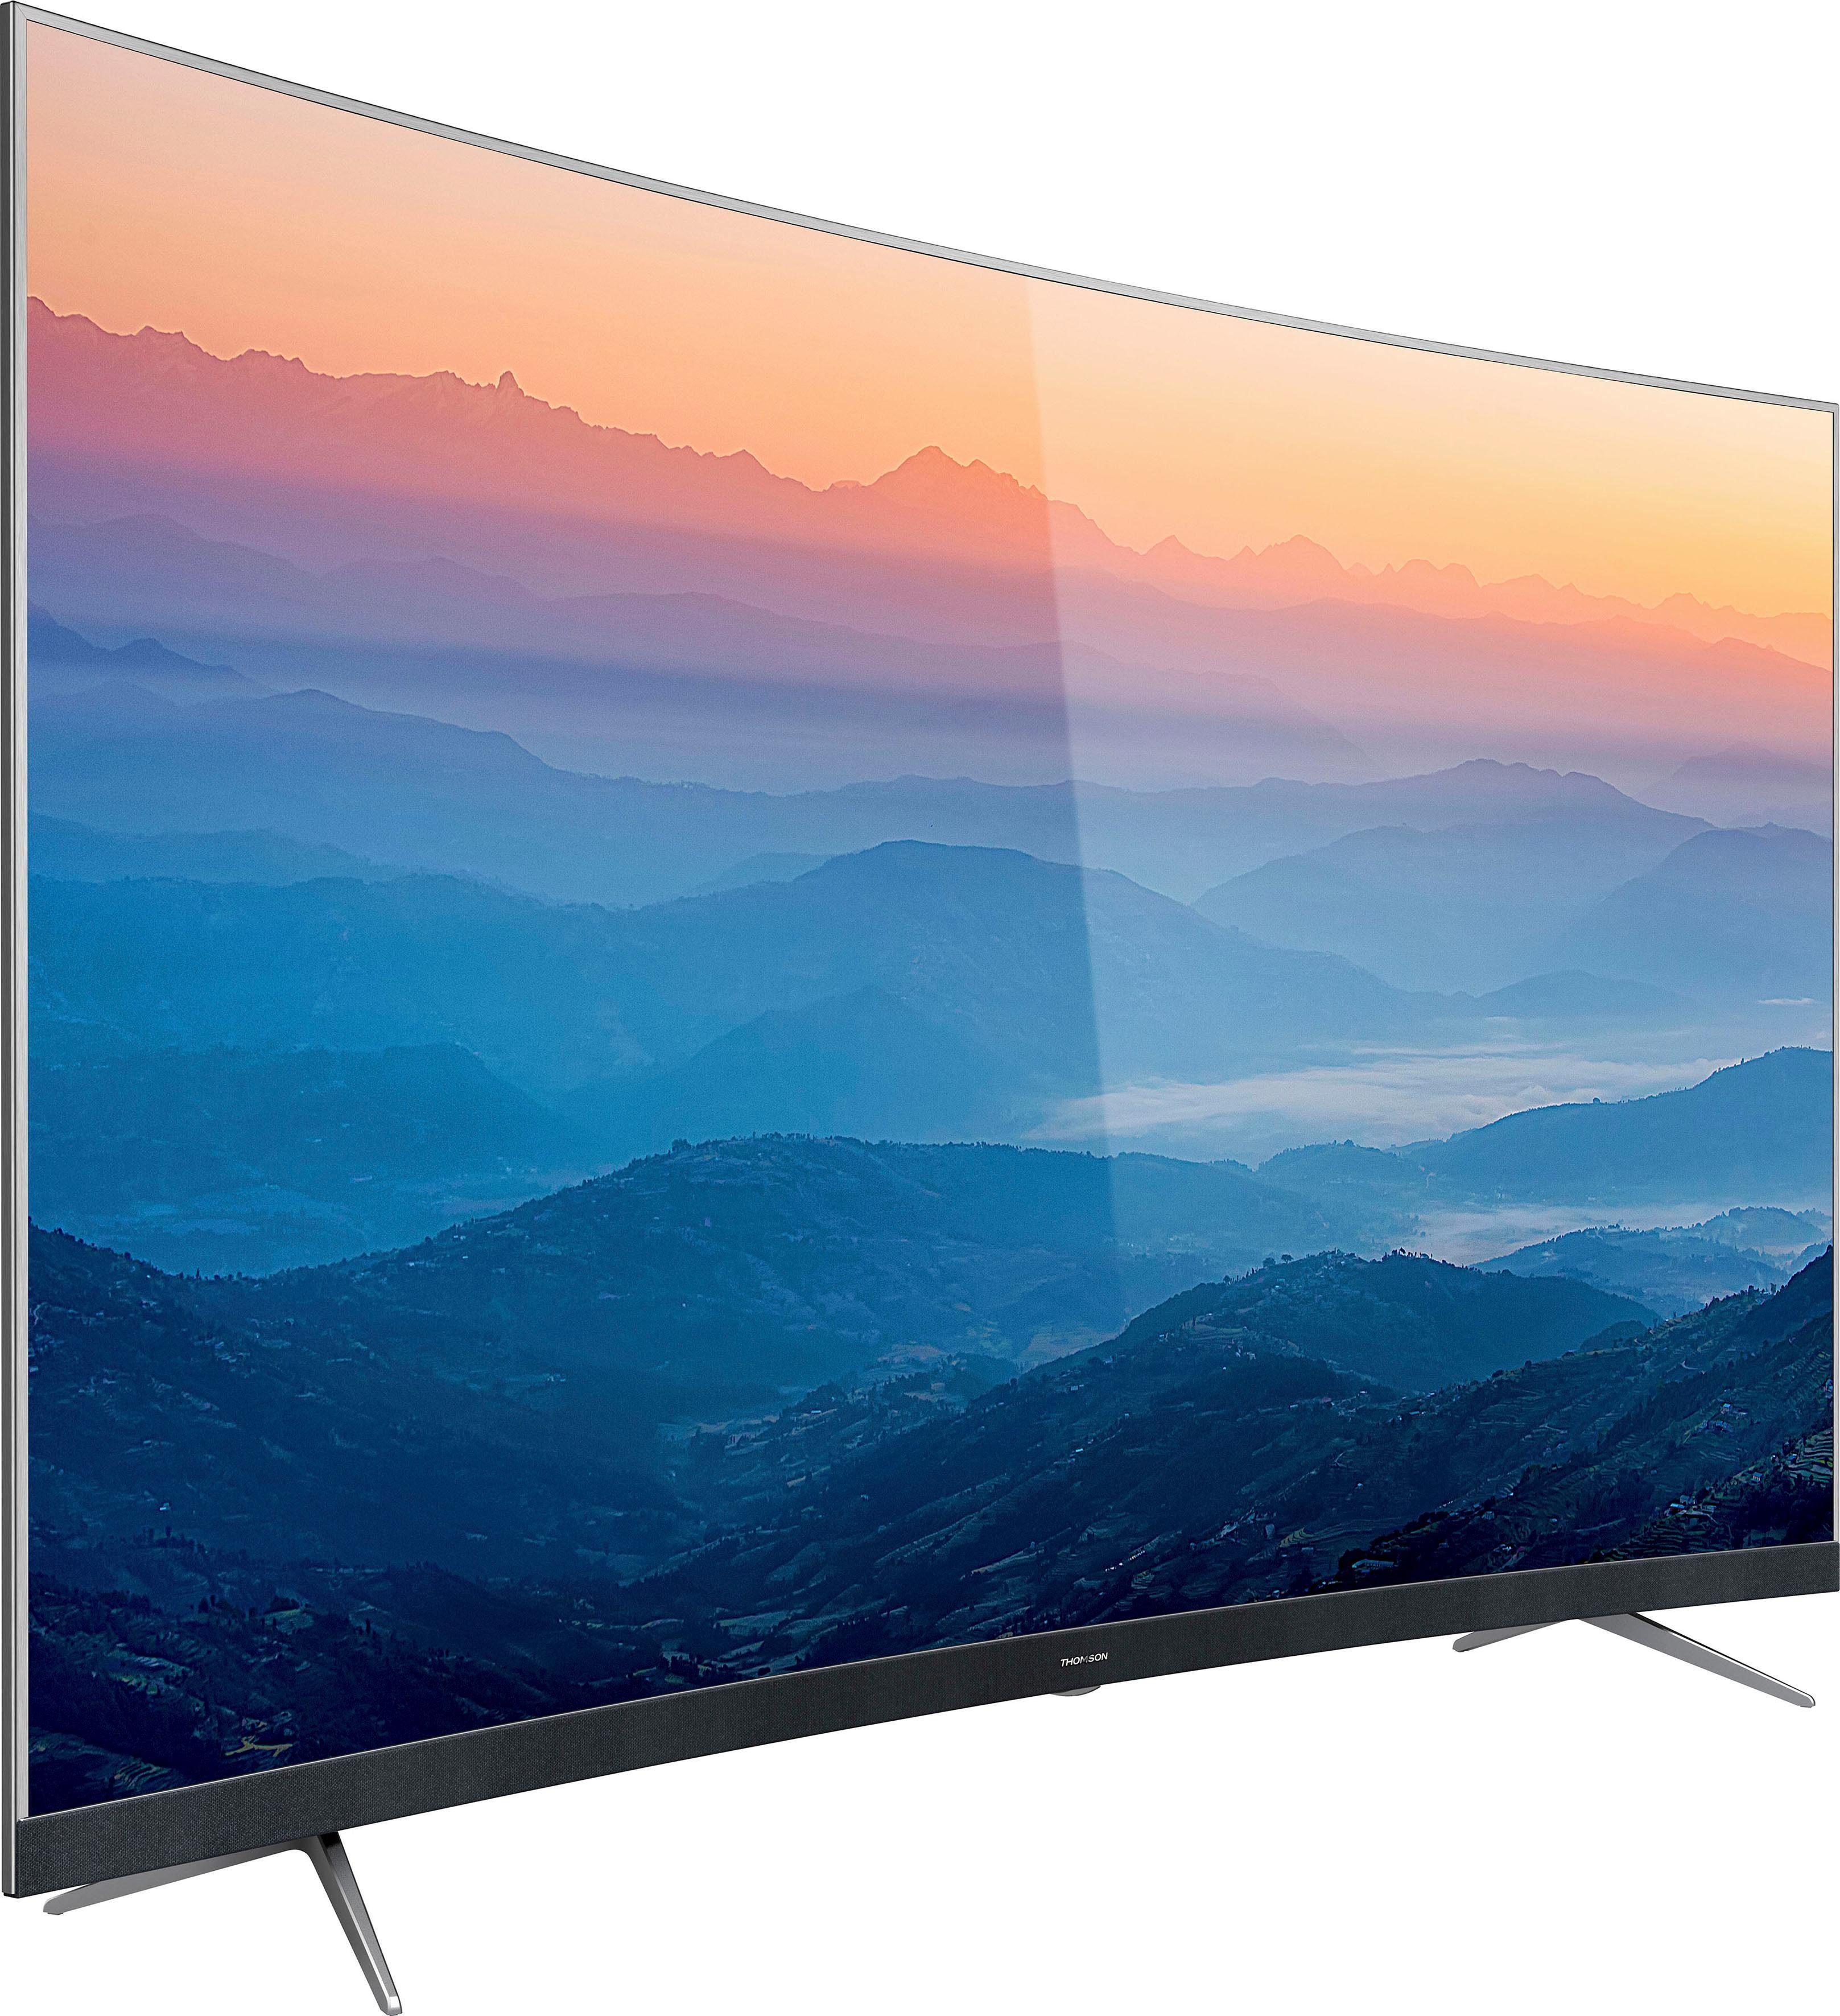 Thomson 65UD6696X1 Curved-LED-Fernseher (164 cm/65 Zoll, 4K Ultra HD, Smart-TV)